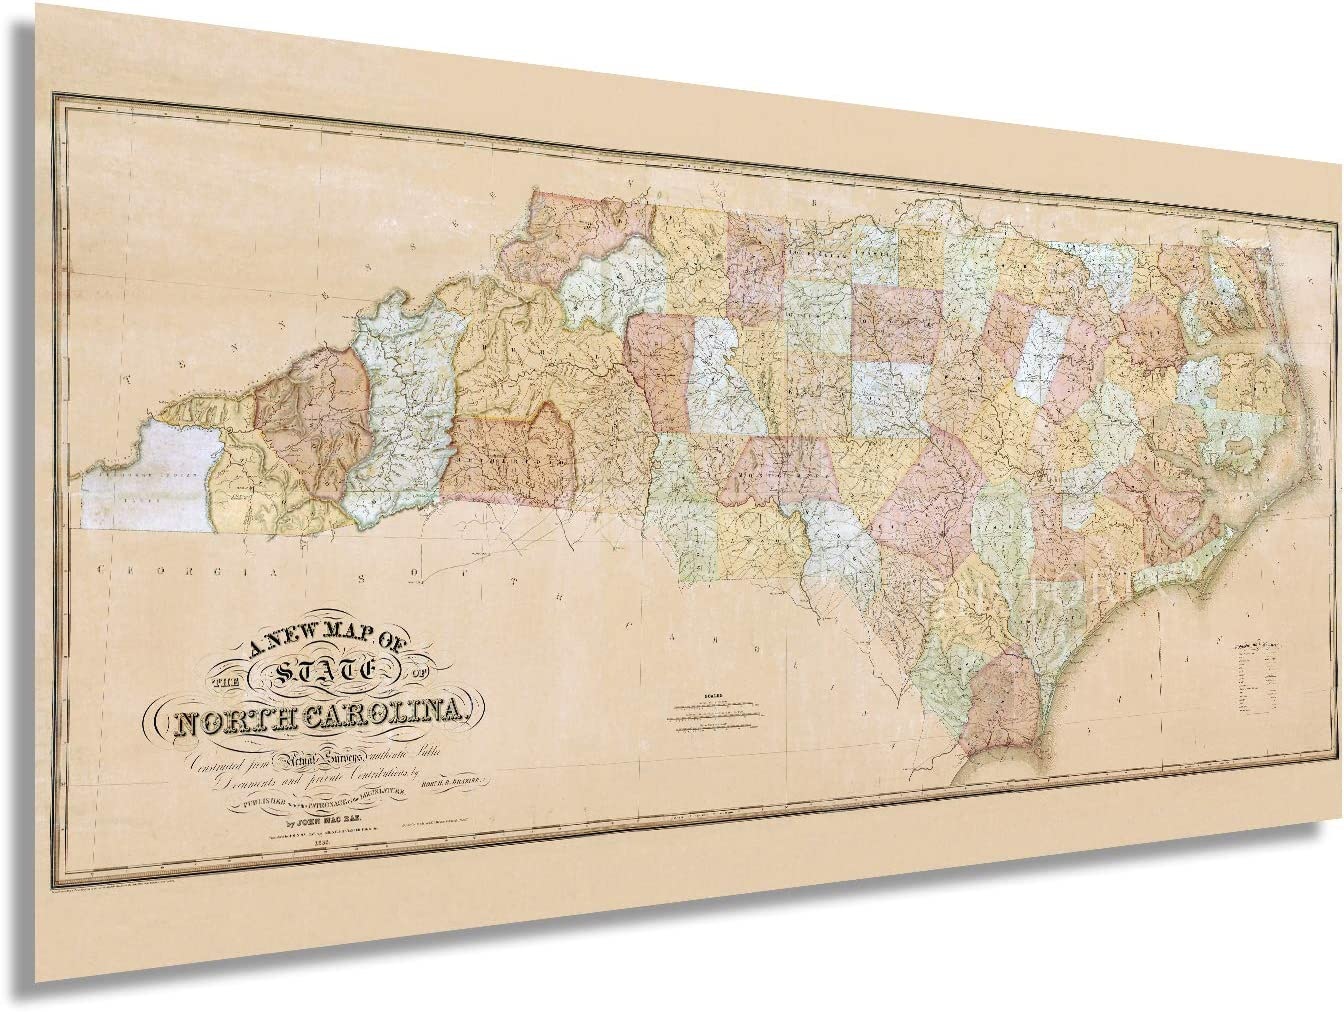 Historix Vintage 1833 North Carolina State Map - 12x24 Inch North Carolina Vintage Map Constructed from Actual Surveys - NC Wall Art - North Carolina Map Wall Decor - North Carolina Poster (2 Sizes)